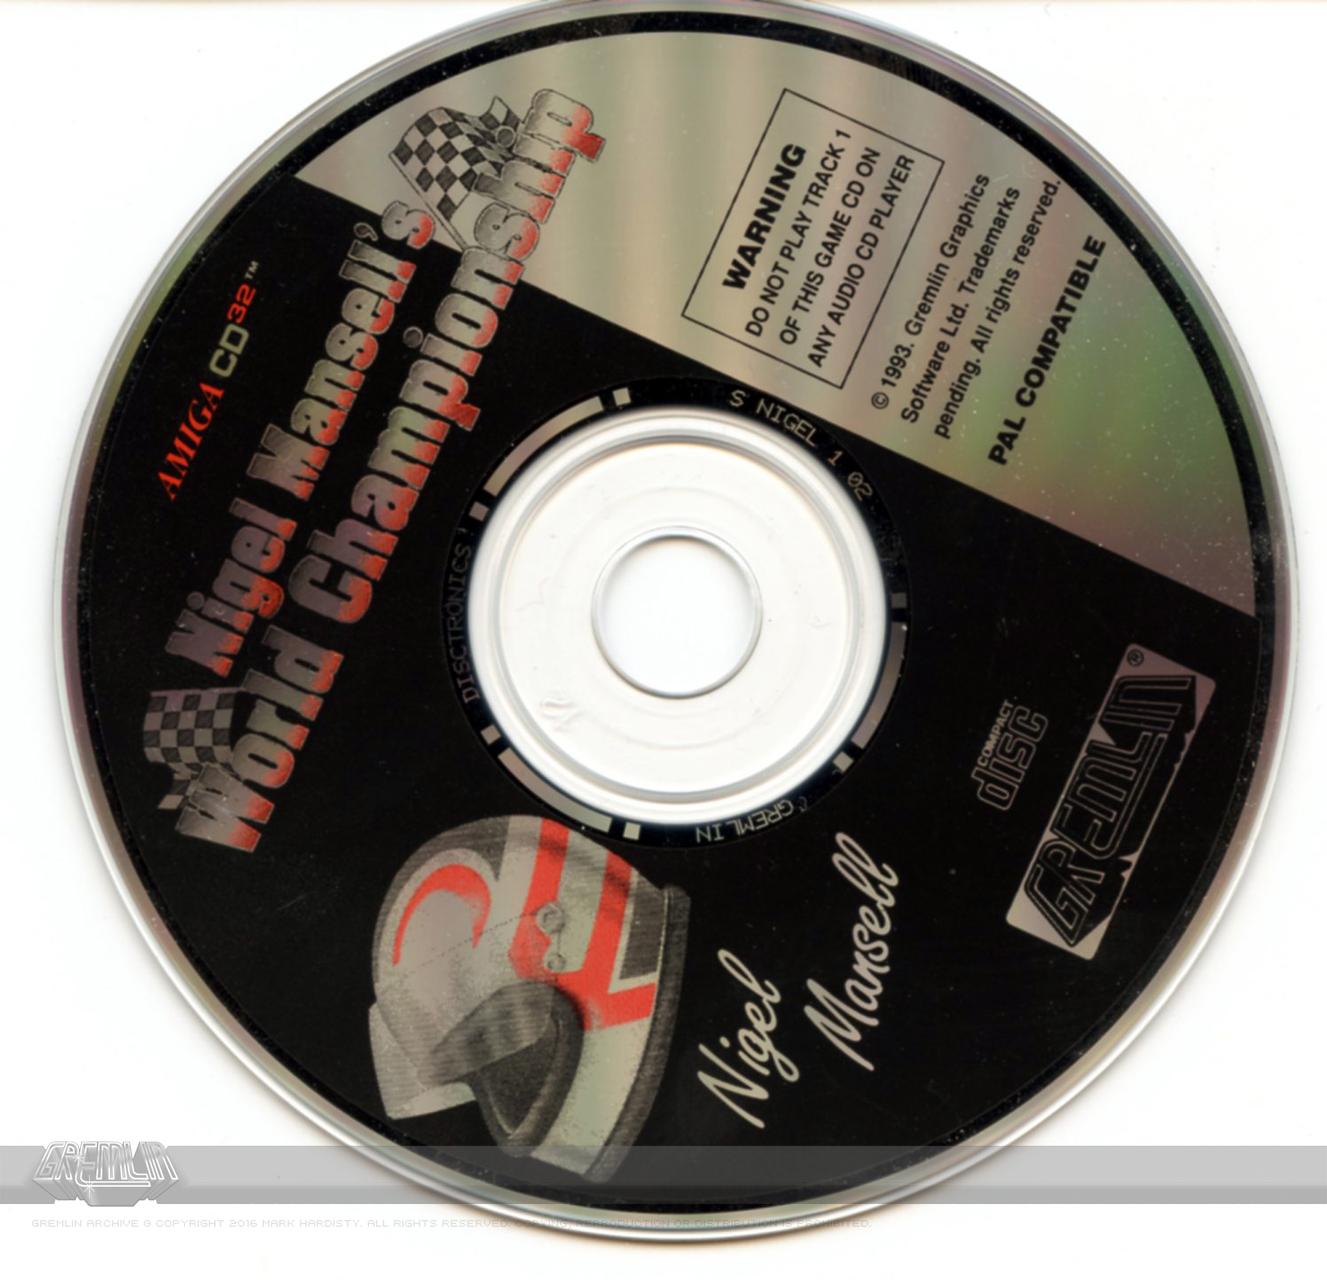 Nigel Mansell's World Championship (CD32) CD-ROM